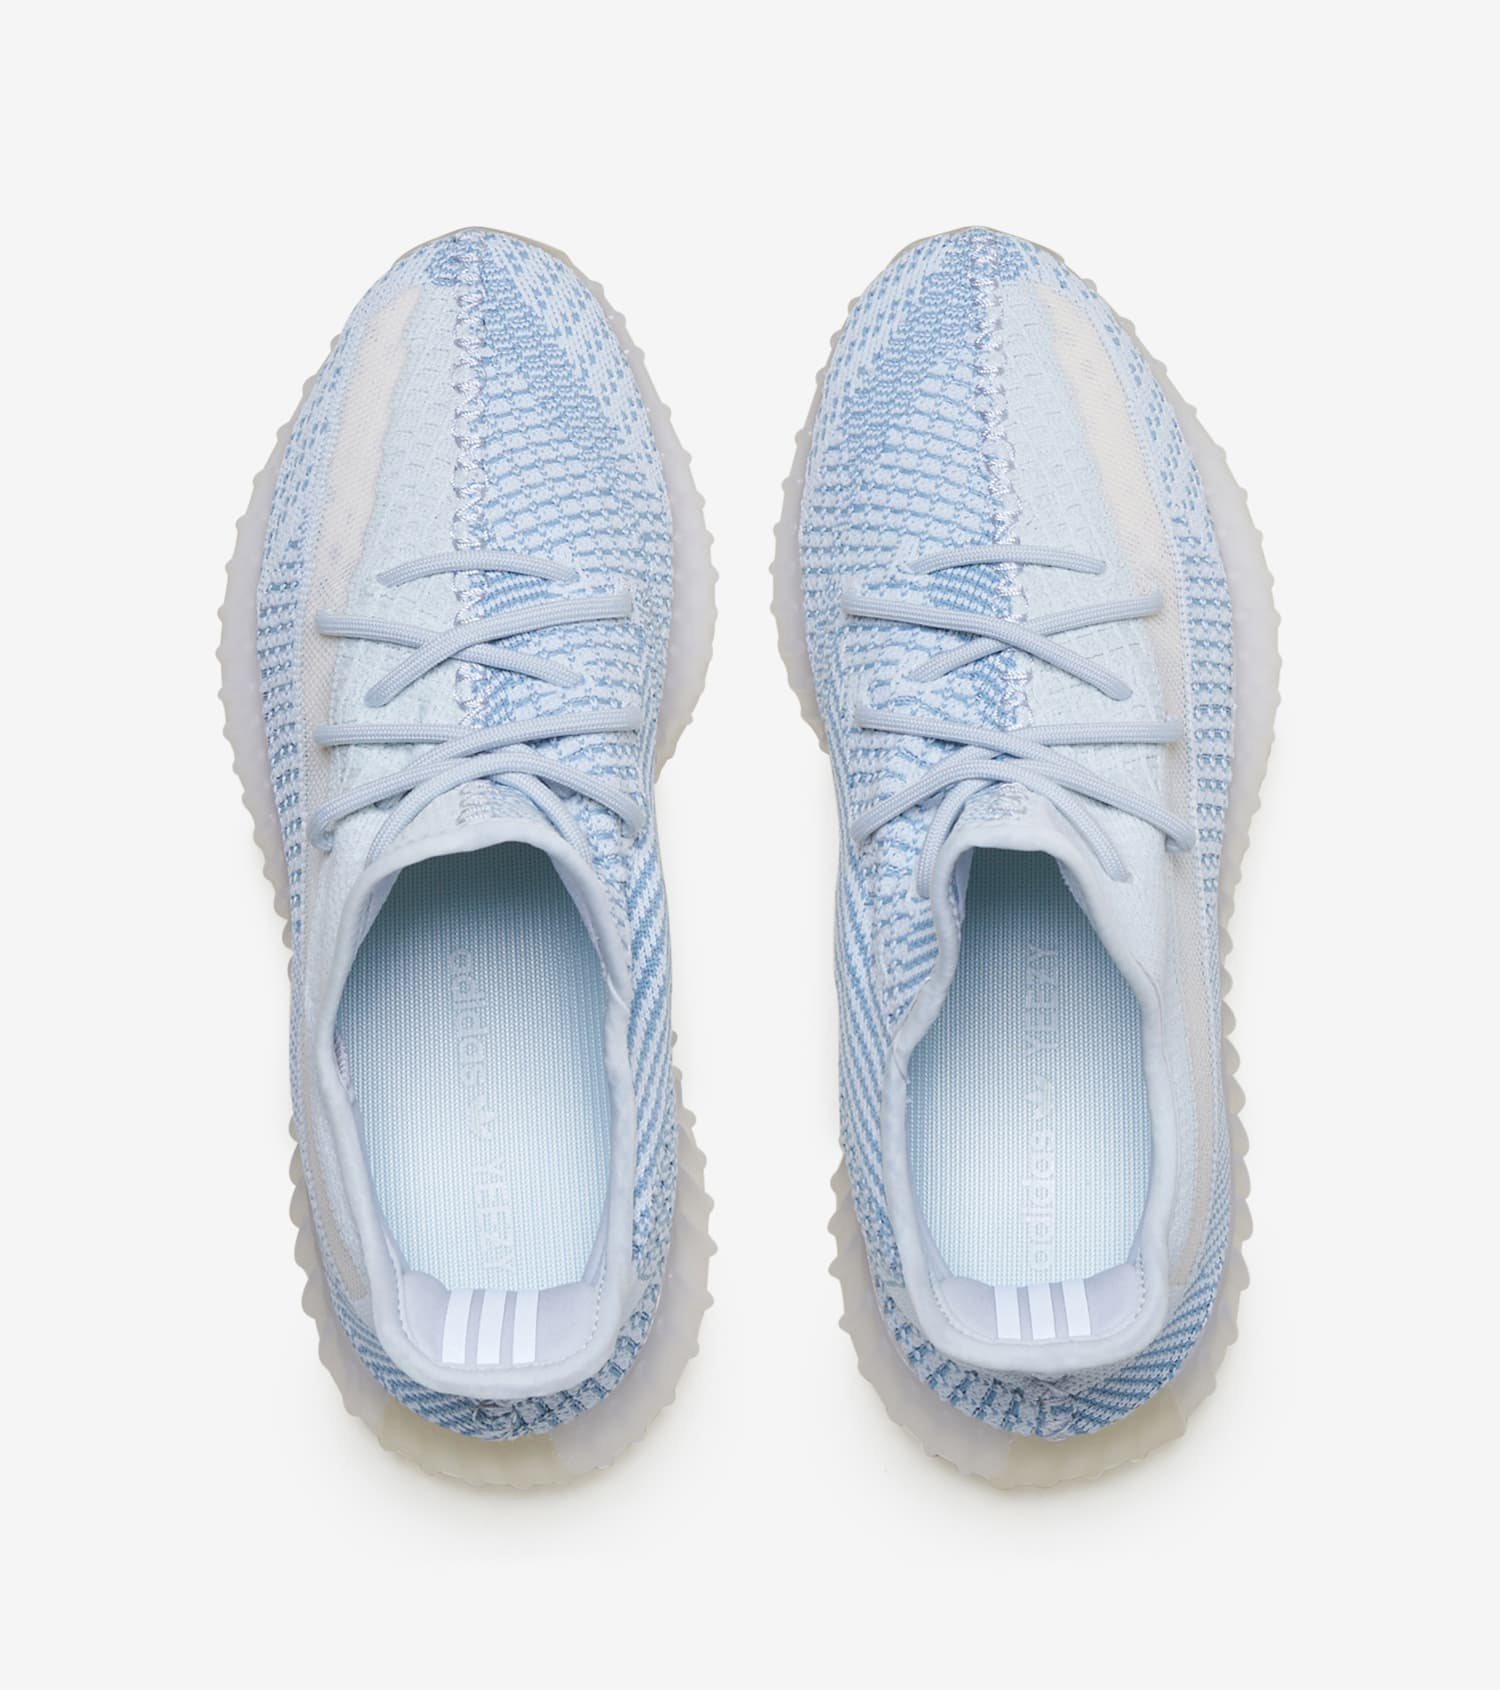 shades of footwear new release Yeezy Boost 350